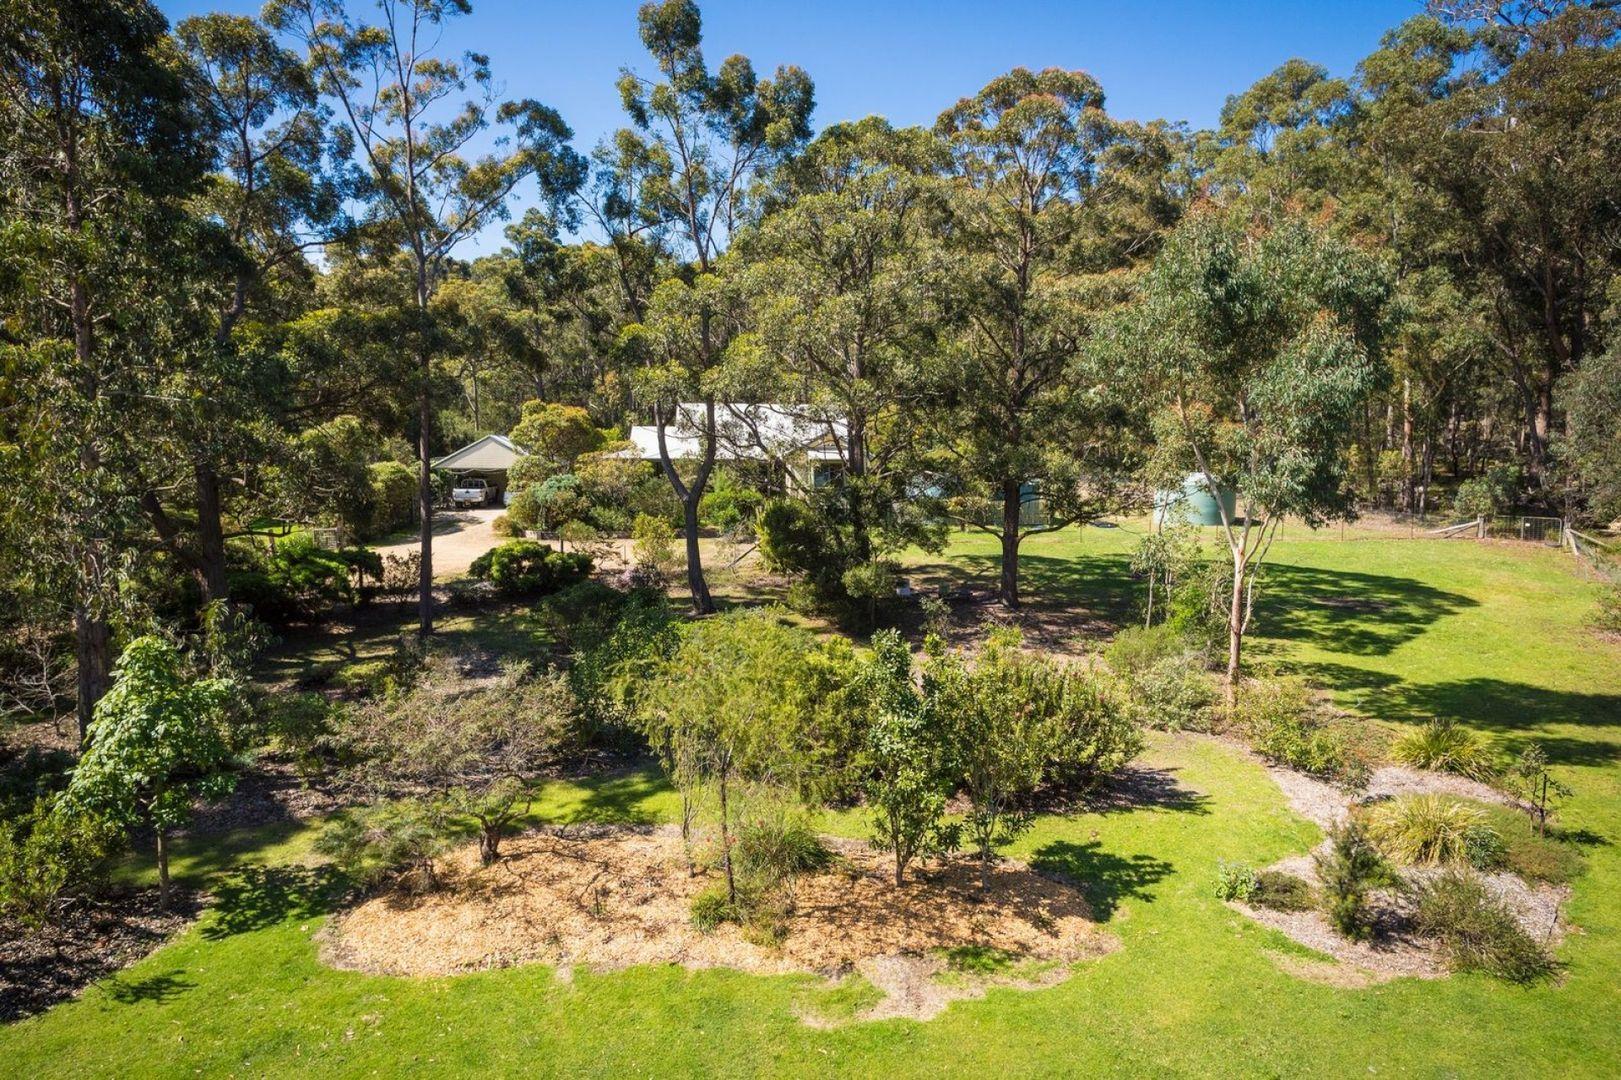 85 Bournda Park  Way, Kalaru NSW 2550, Image 2